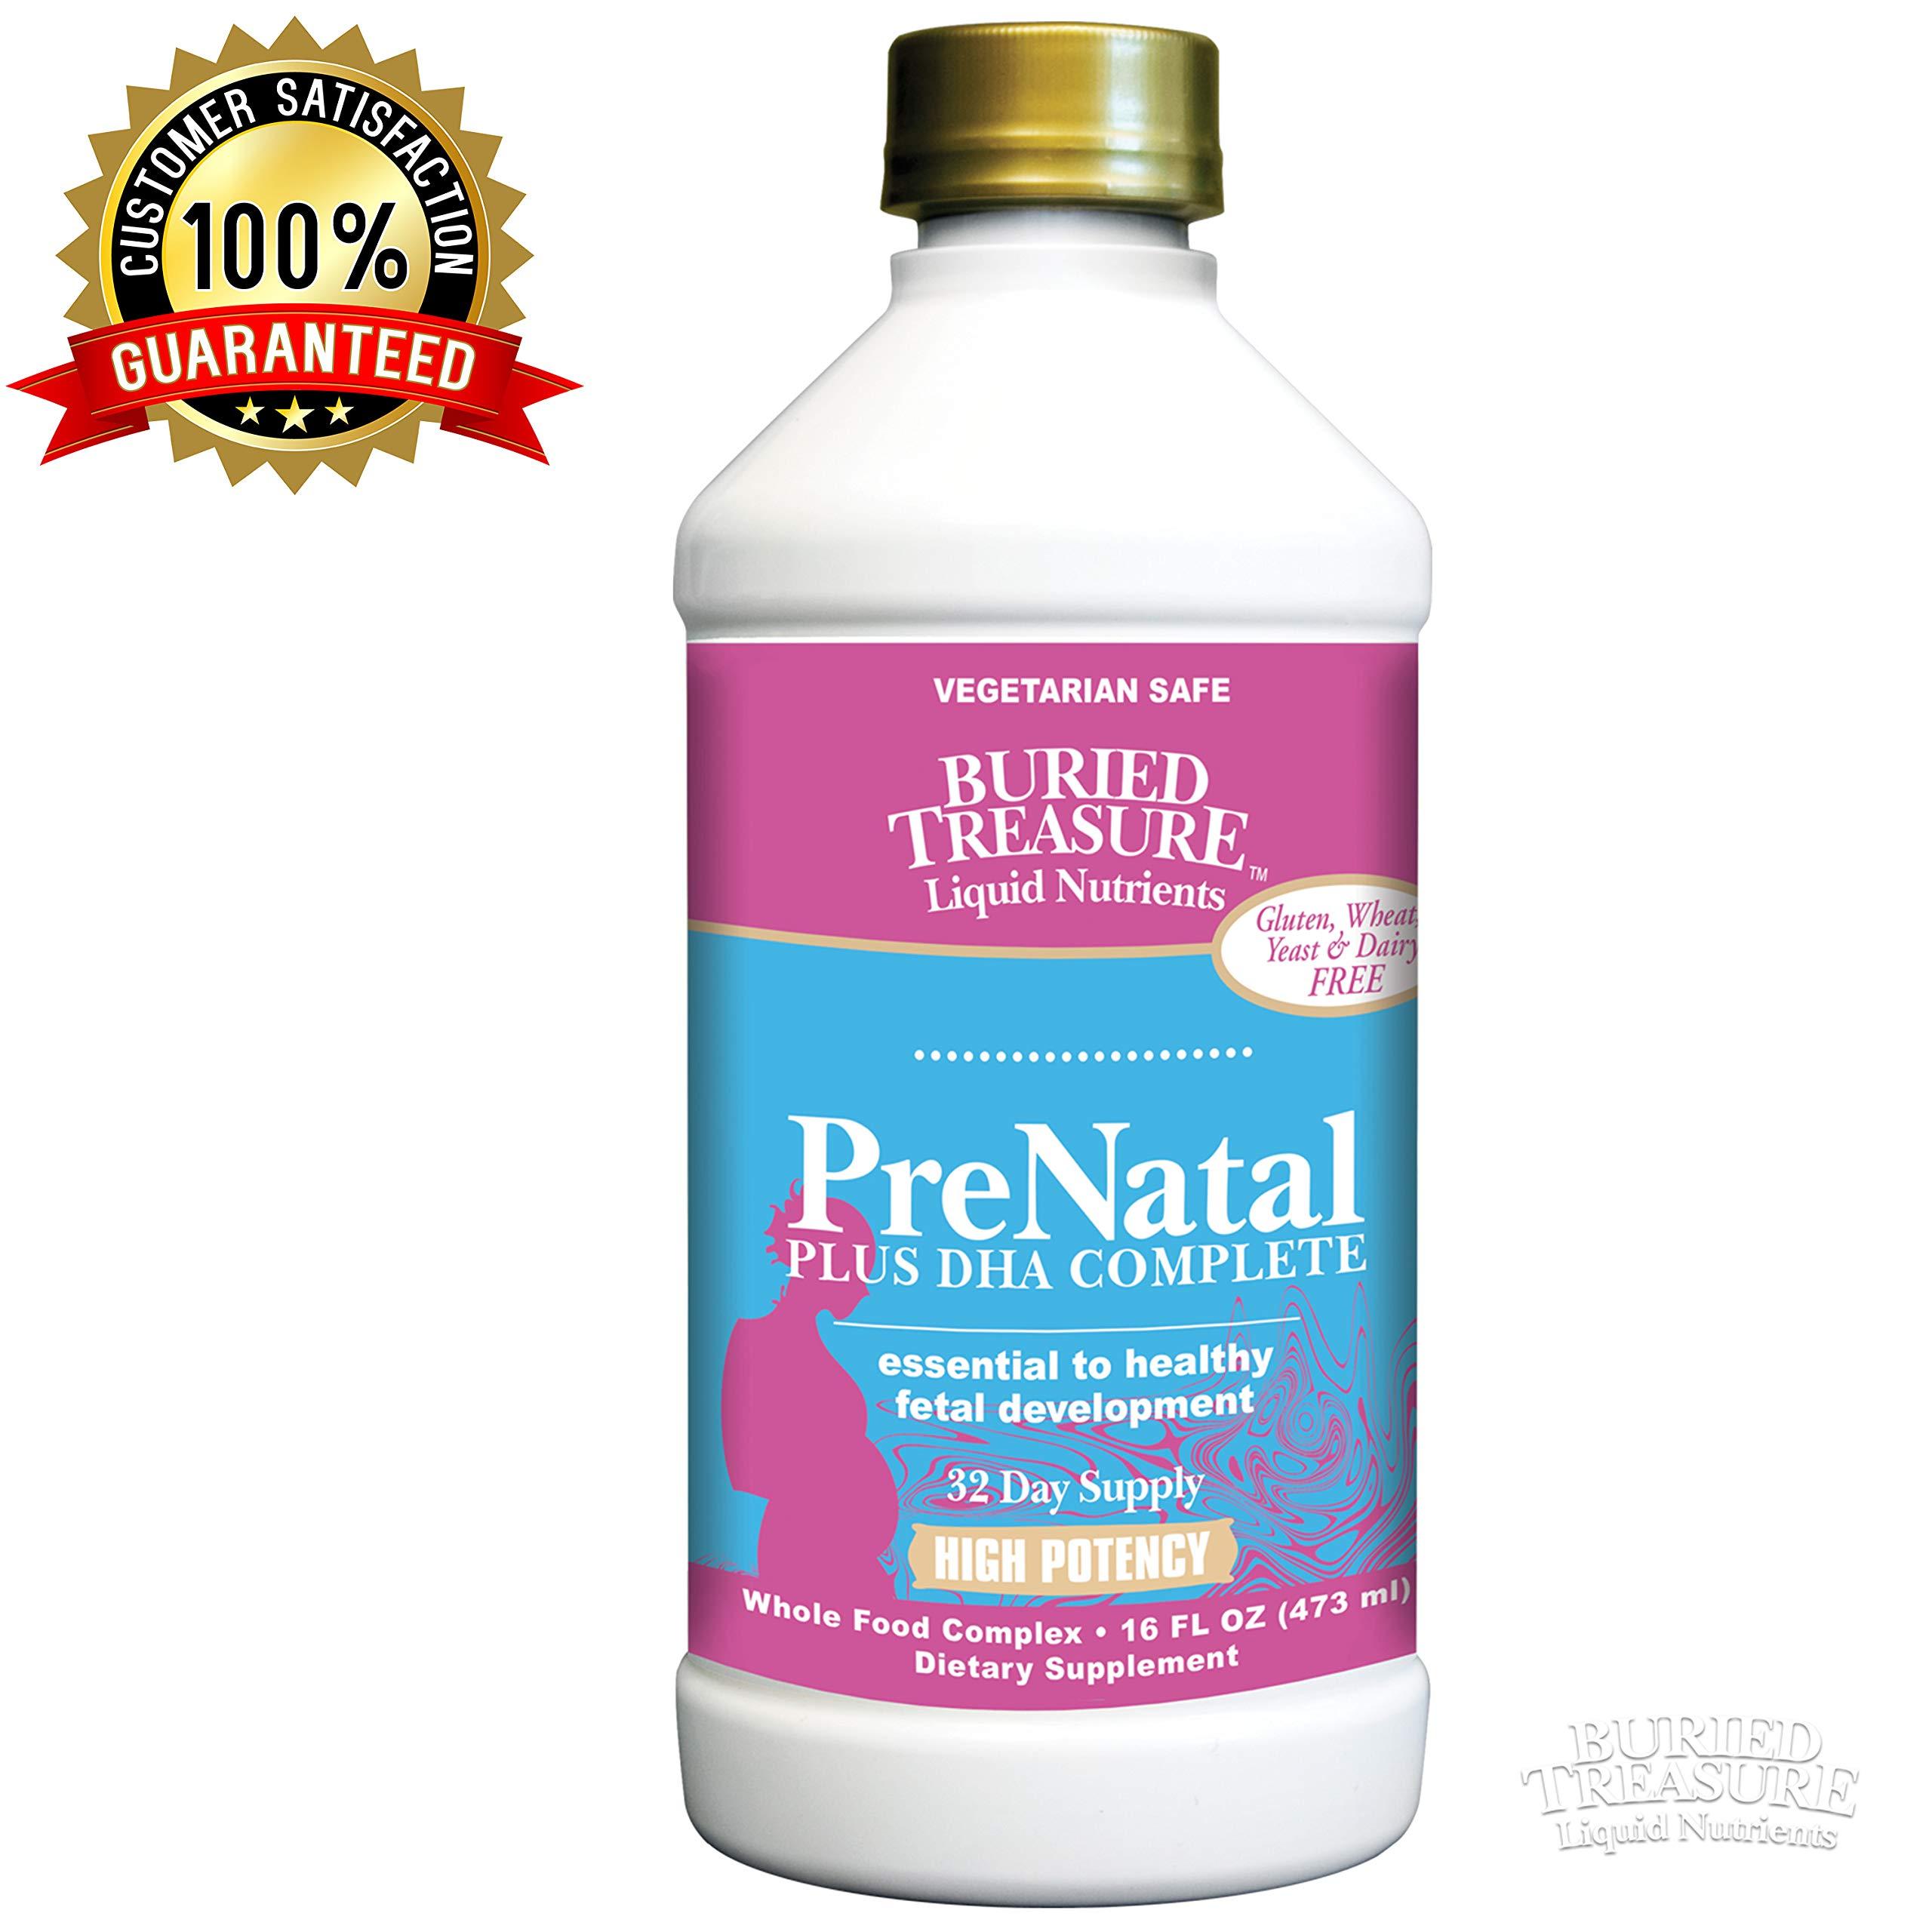 Buried Treasure Prenatal Plus DHA Complete High Potency Liquid Supplement - Non-GMO, Plant Based, High Quality, Vegetarian Safe - 16 oz